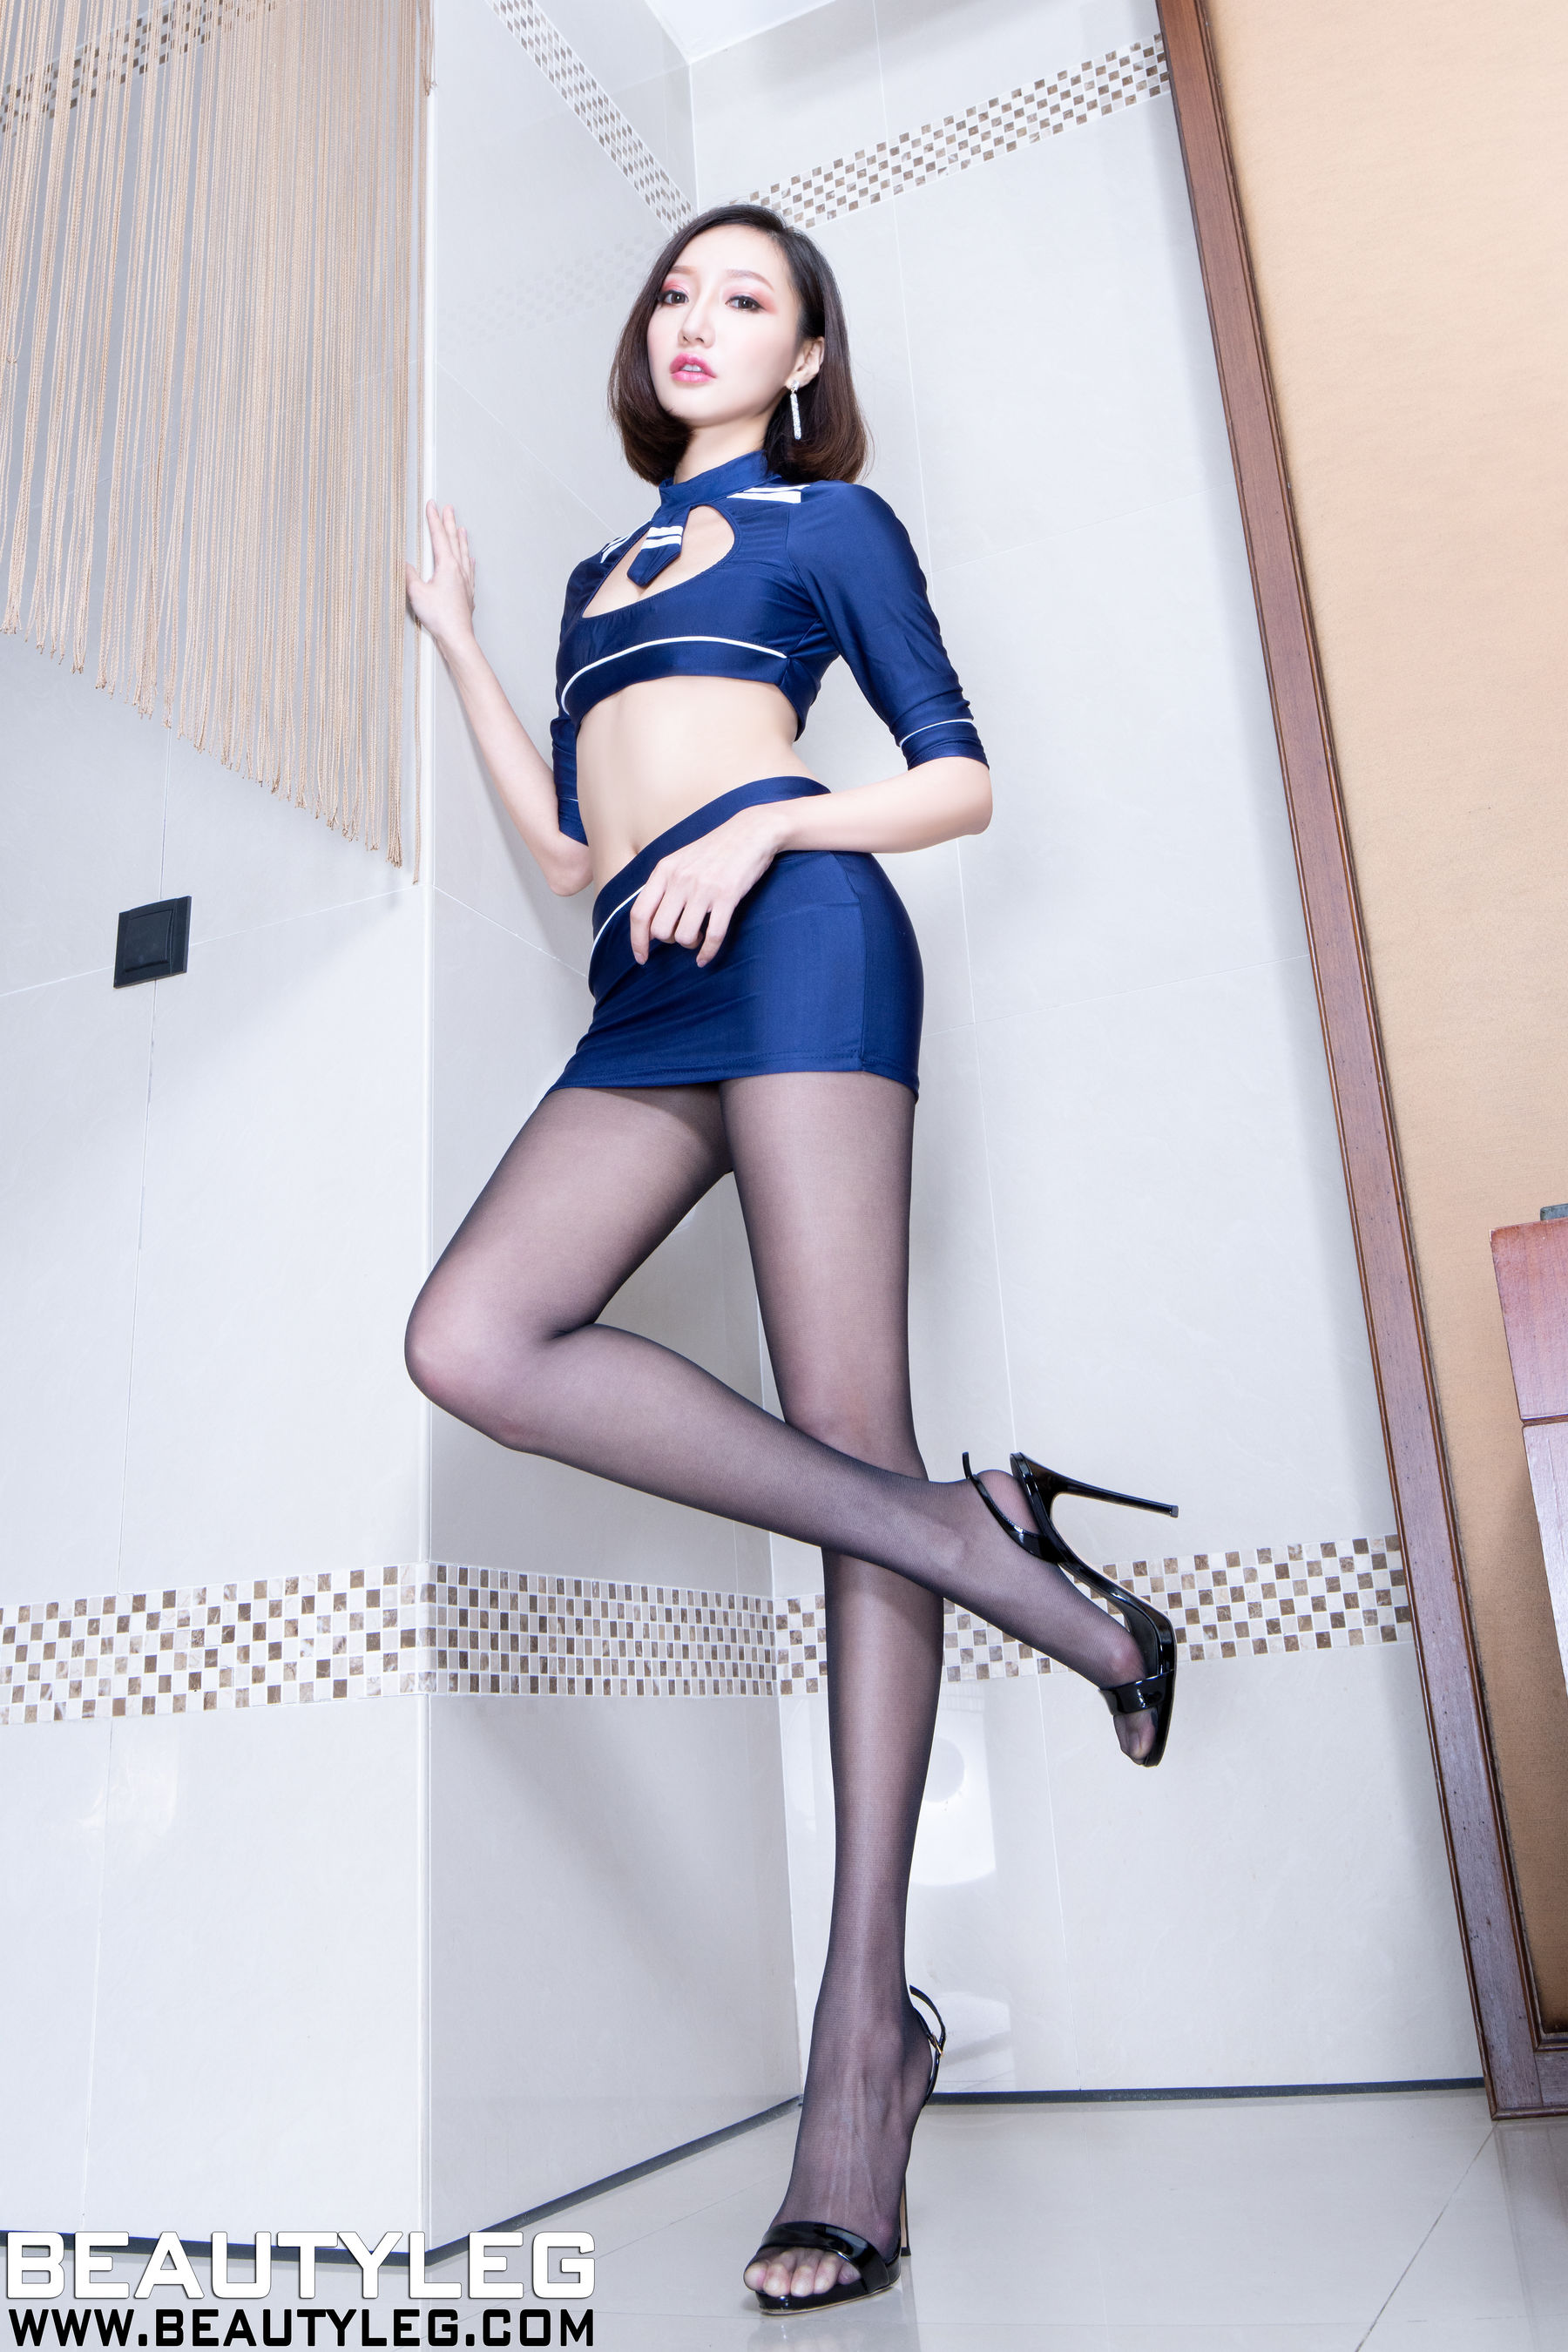 VOL.953 [Beautyleg]丝袜美腿:陈思婷(腿模Tina,李霜)超高清个人性感漂亮大图(48P)